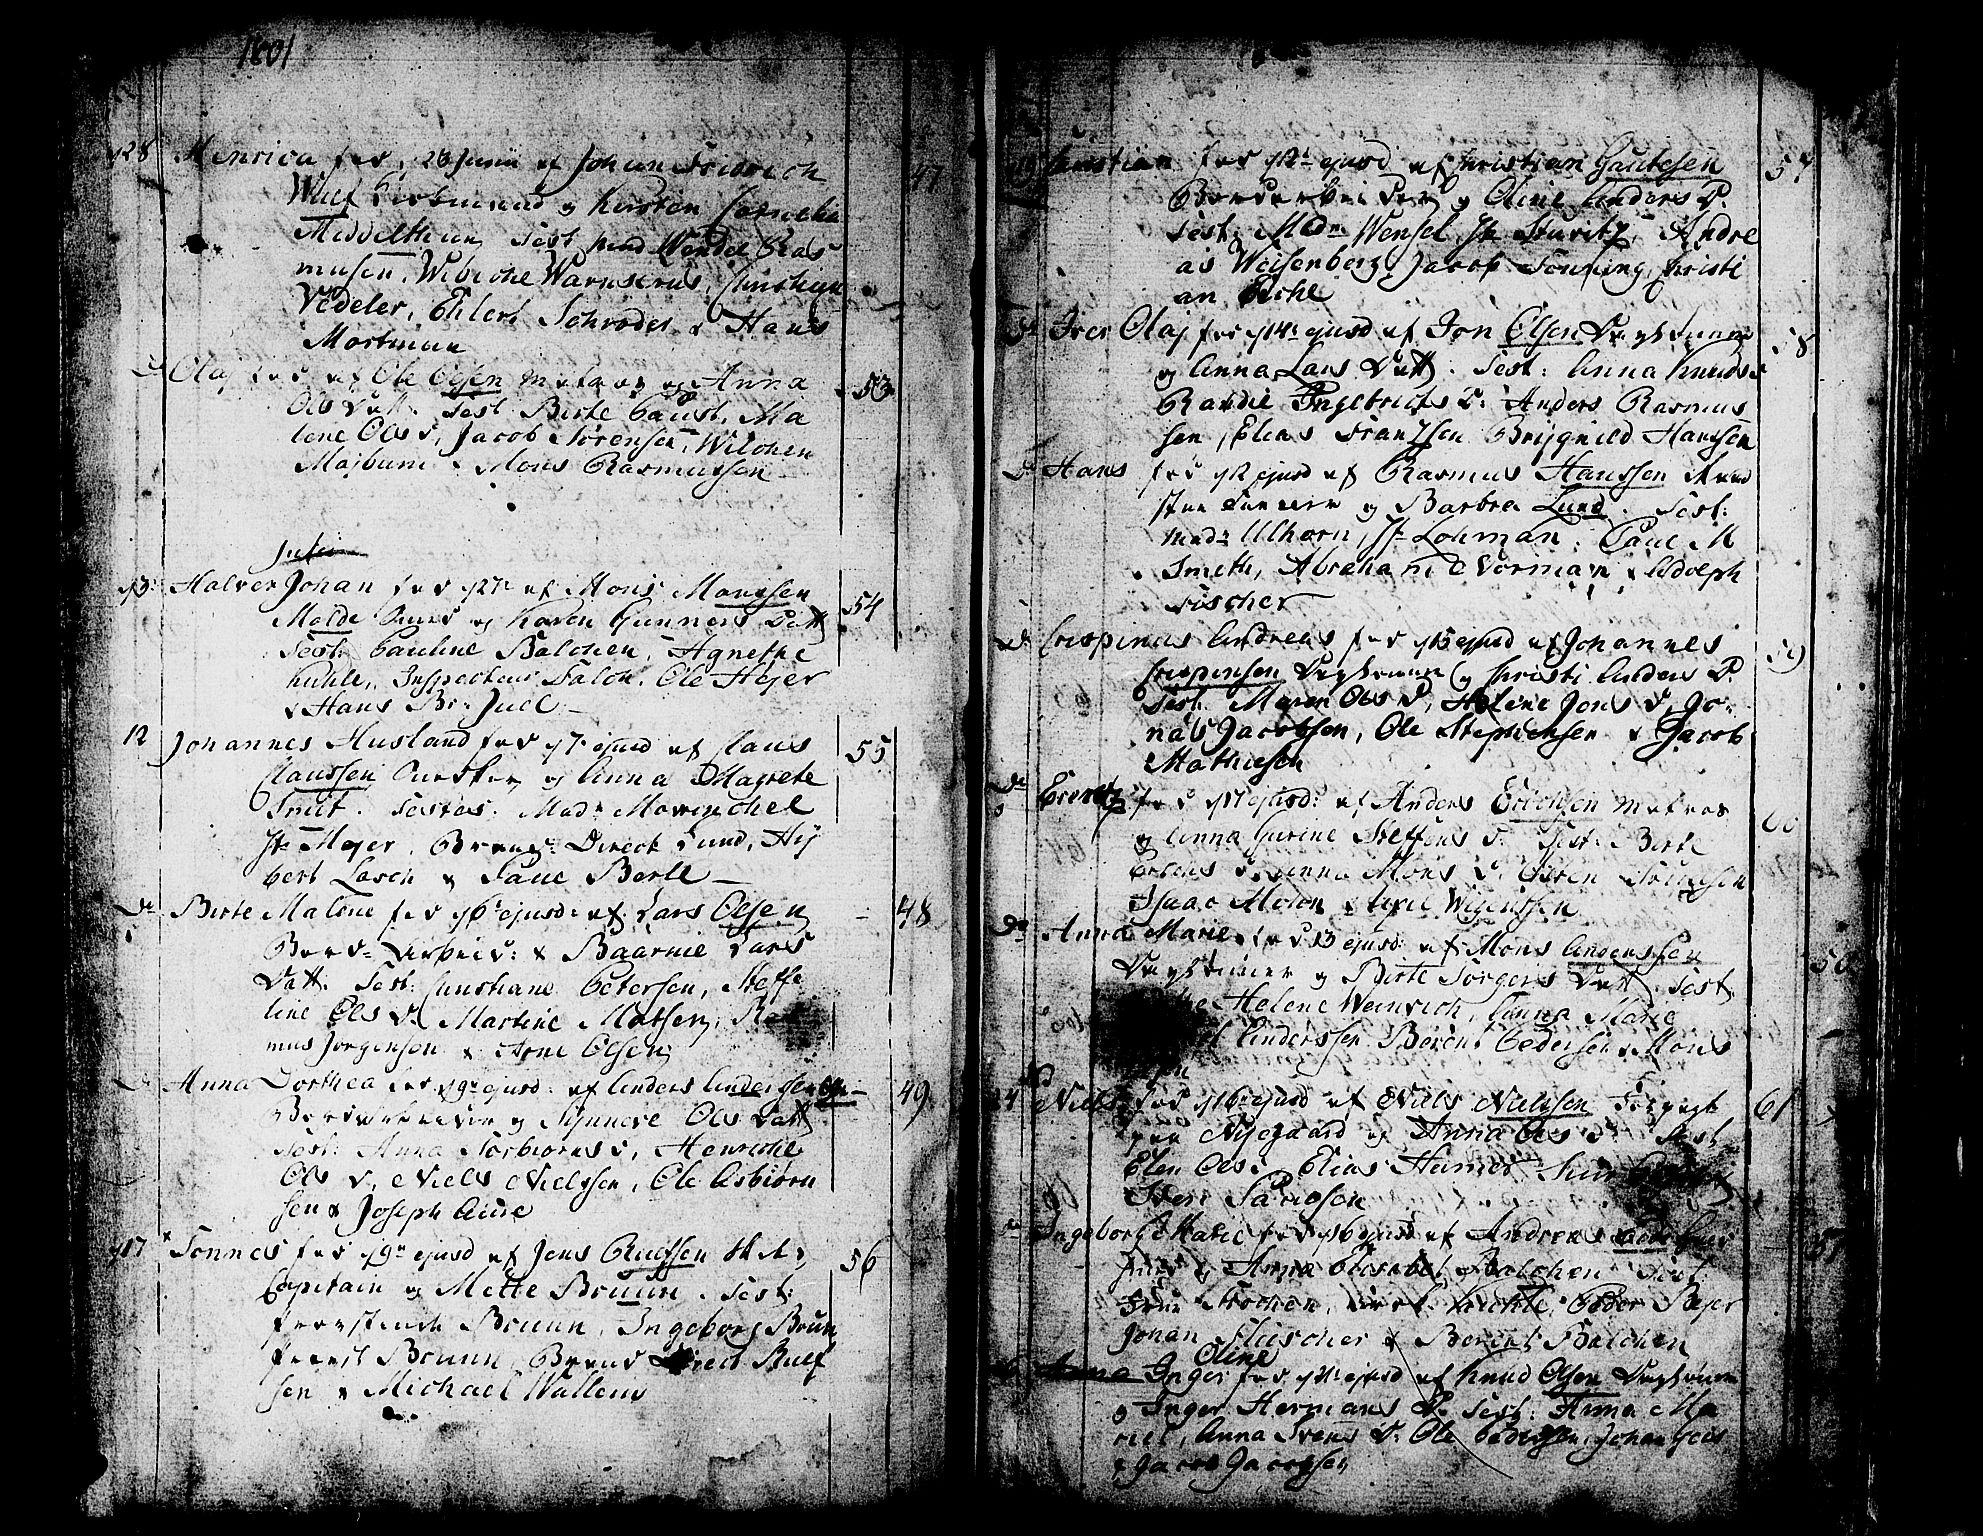 SAB, Domkirken sokneprestembete, H/Haa/L0004: Parish register (official) no. A 4, 1763-1820, p. 256-257